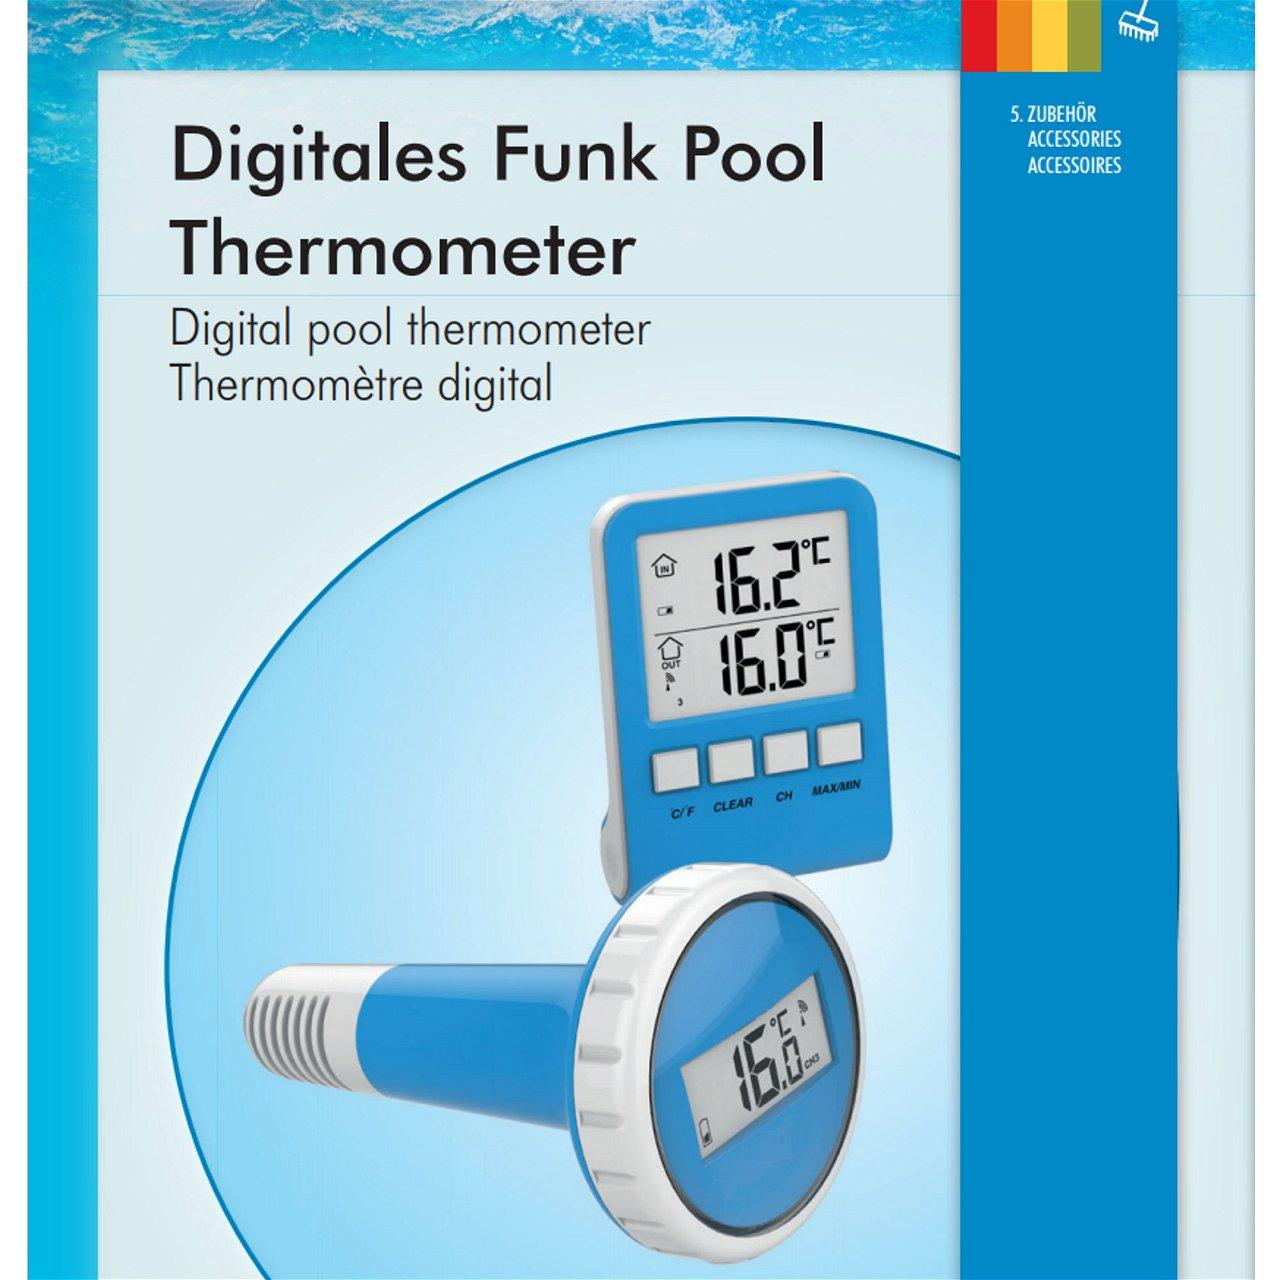 Digitales  Pool Thermometer, Summer Fun